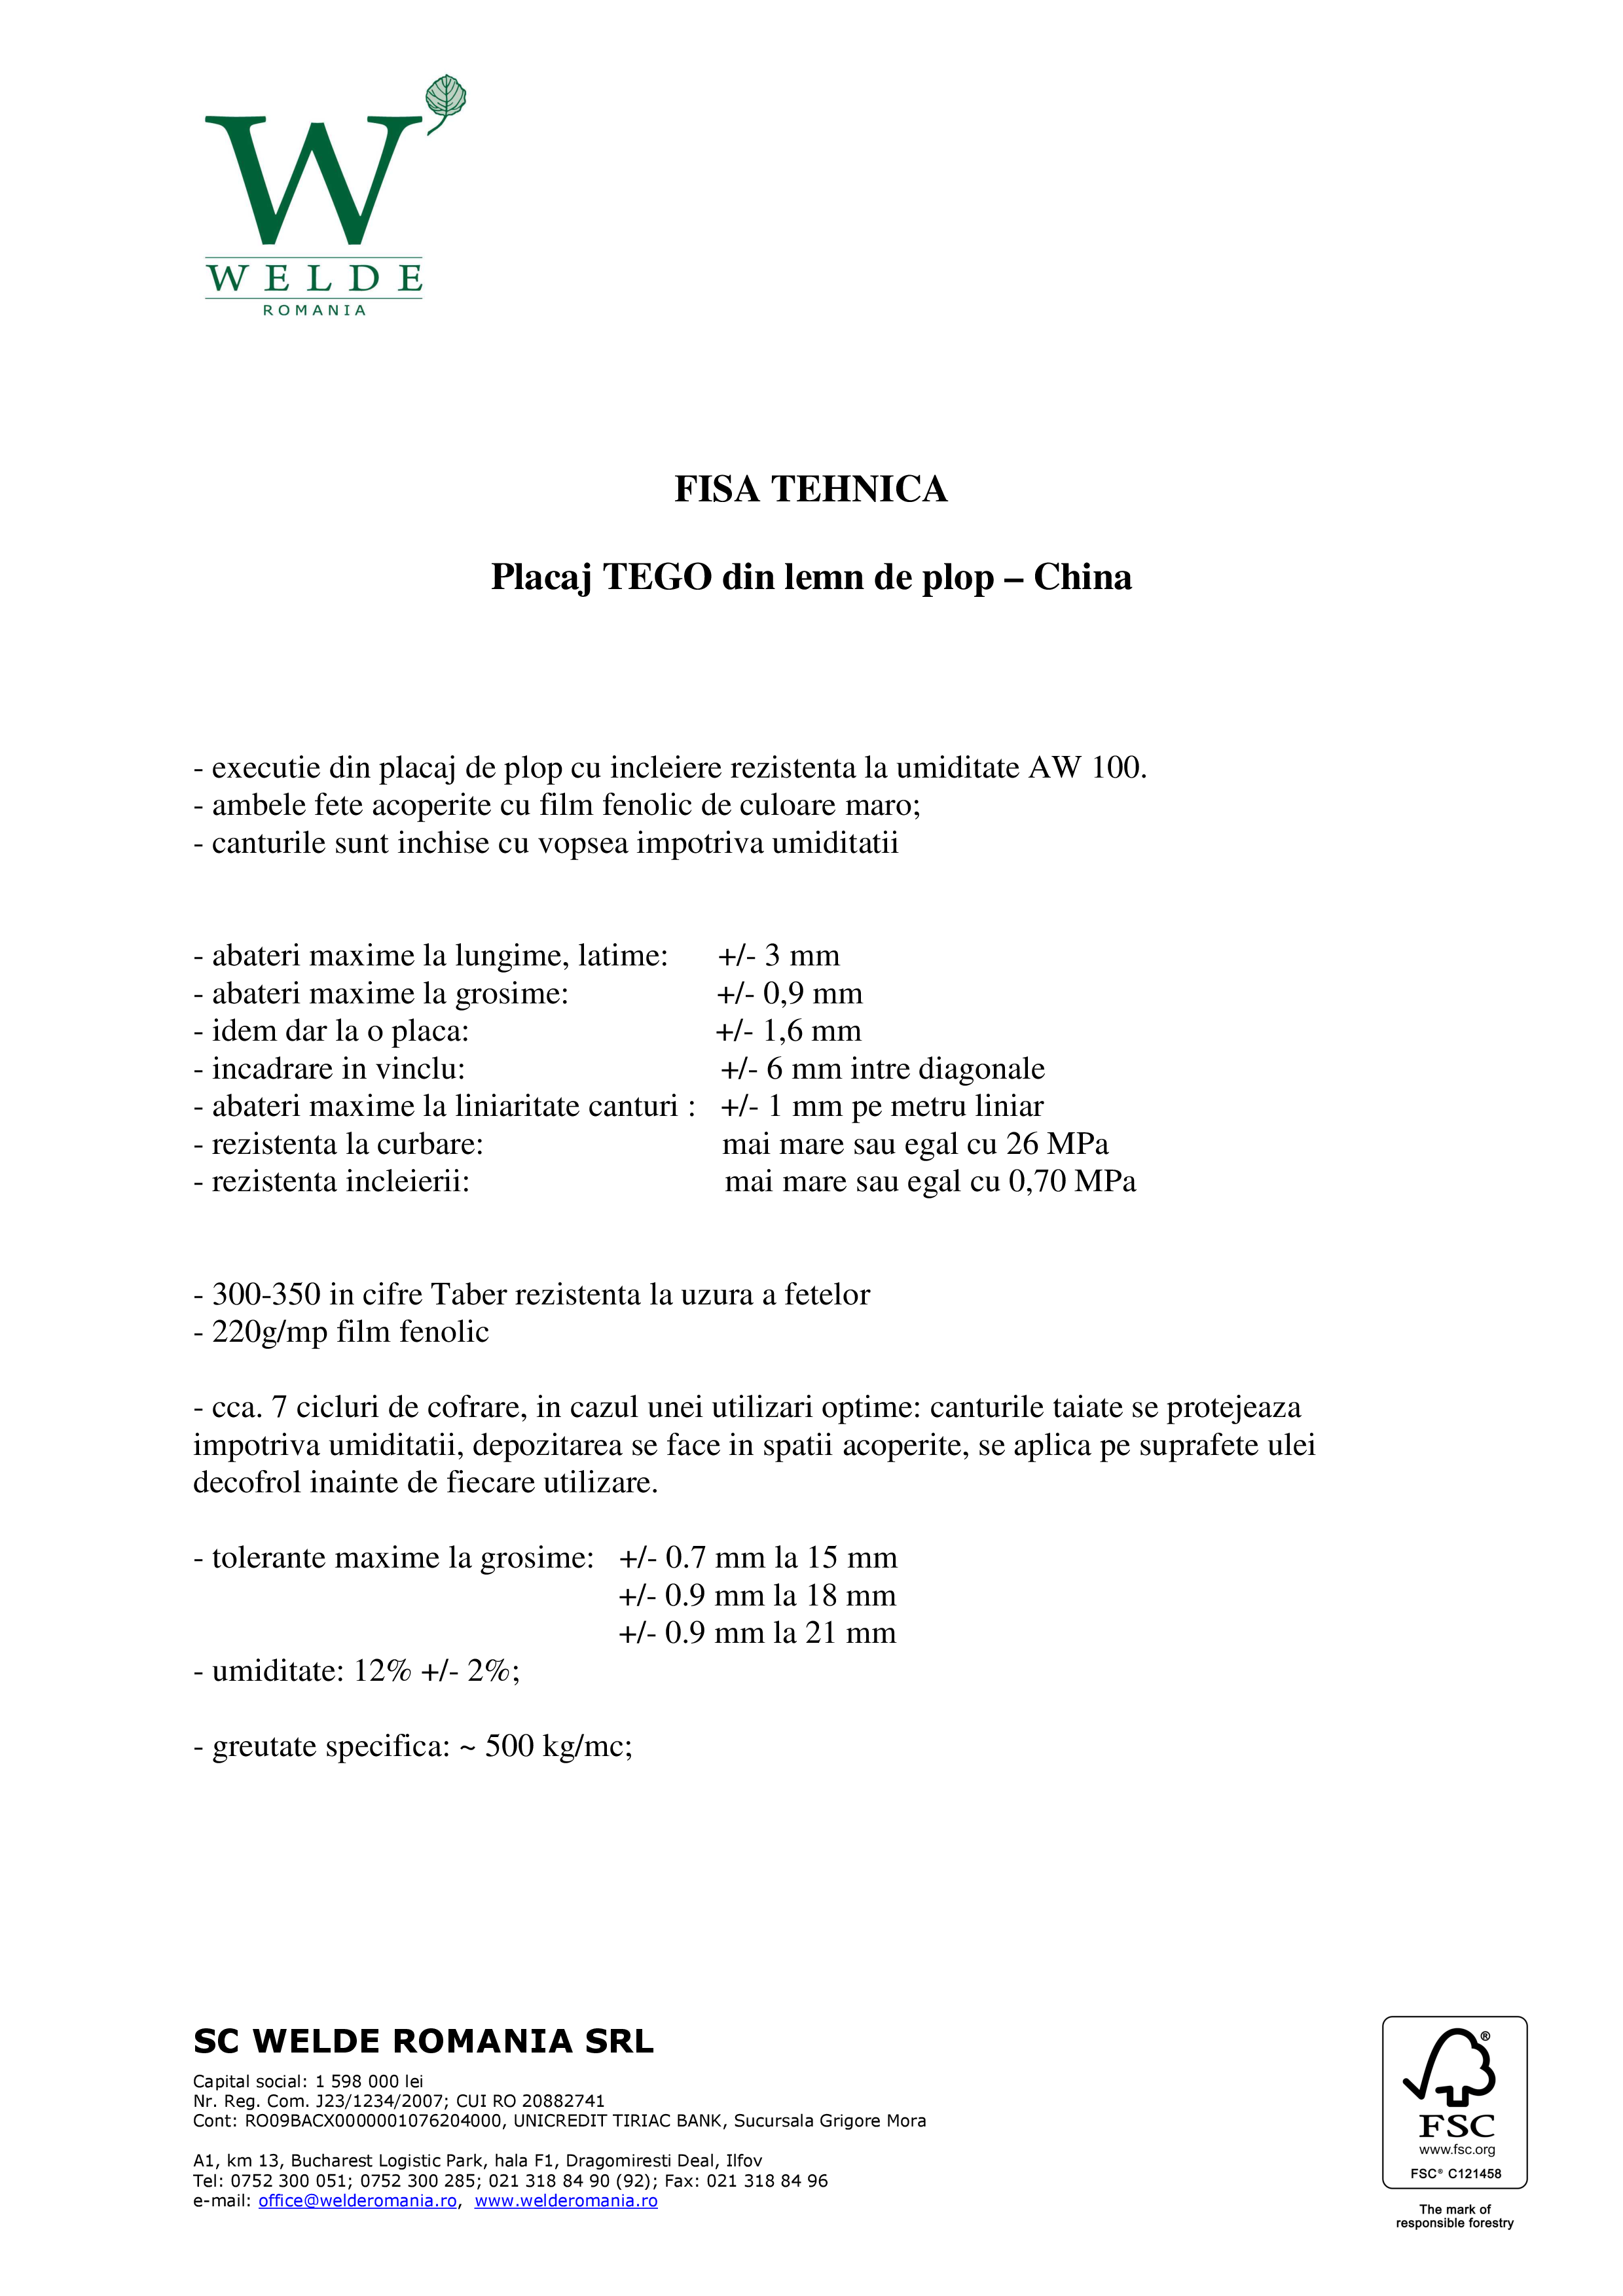 Pagina 1 - Fisa tehnica placaj TEGO import China